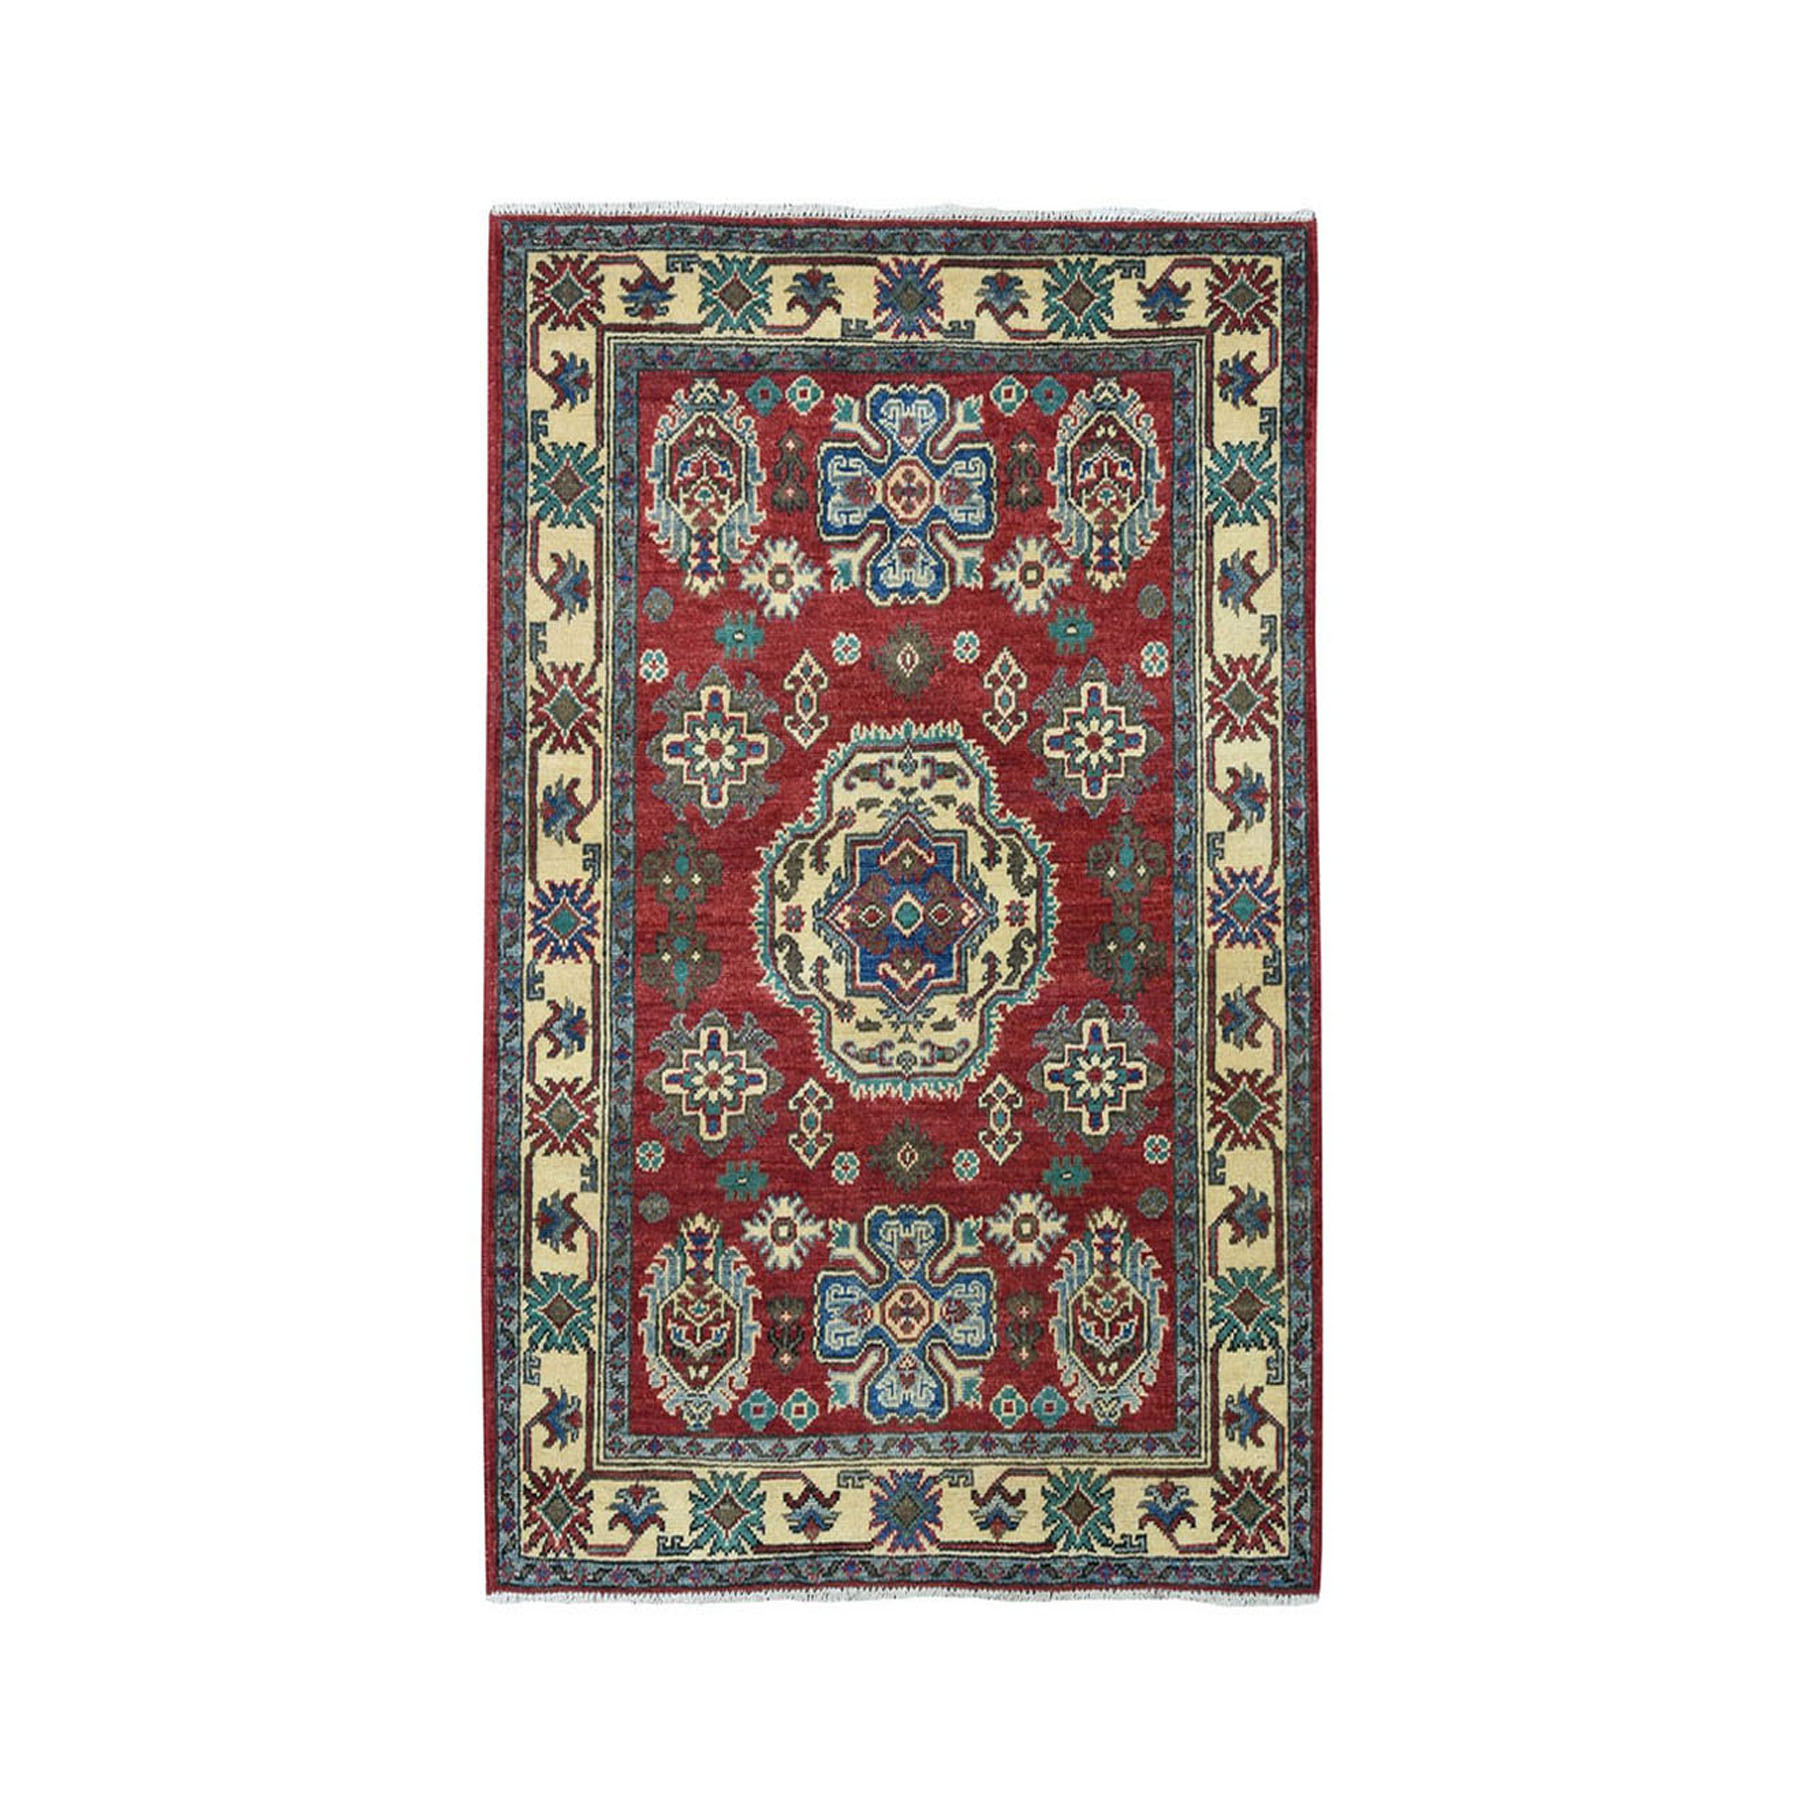 "3'4""X4'8"" Red Kazak Pure Wool Geometric Design Hand-Knotted Oriental Rug"